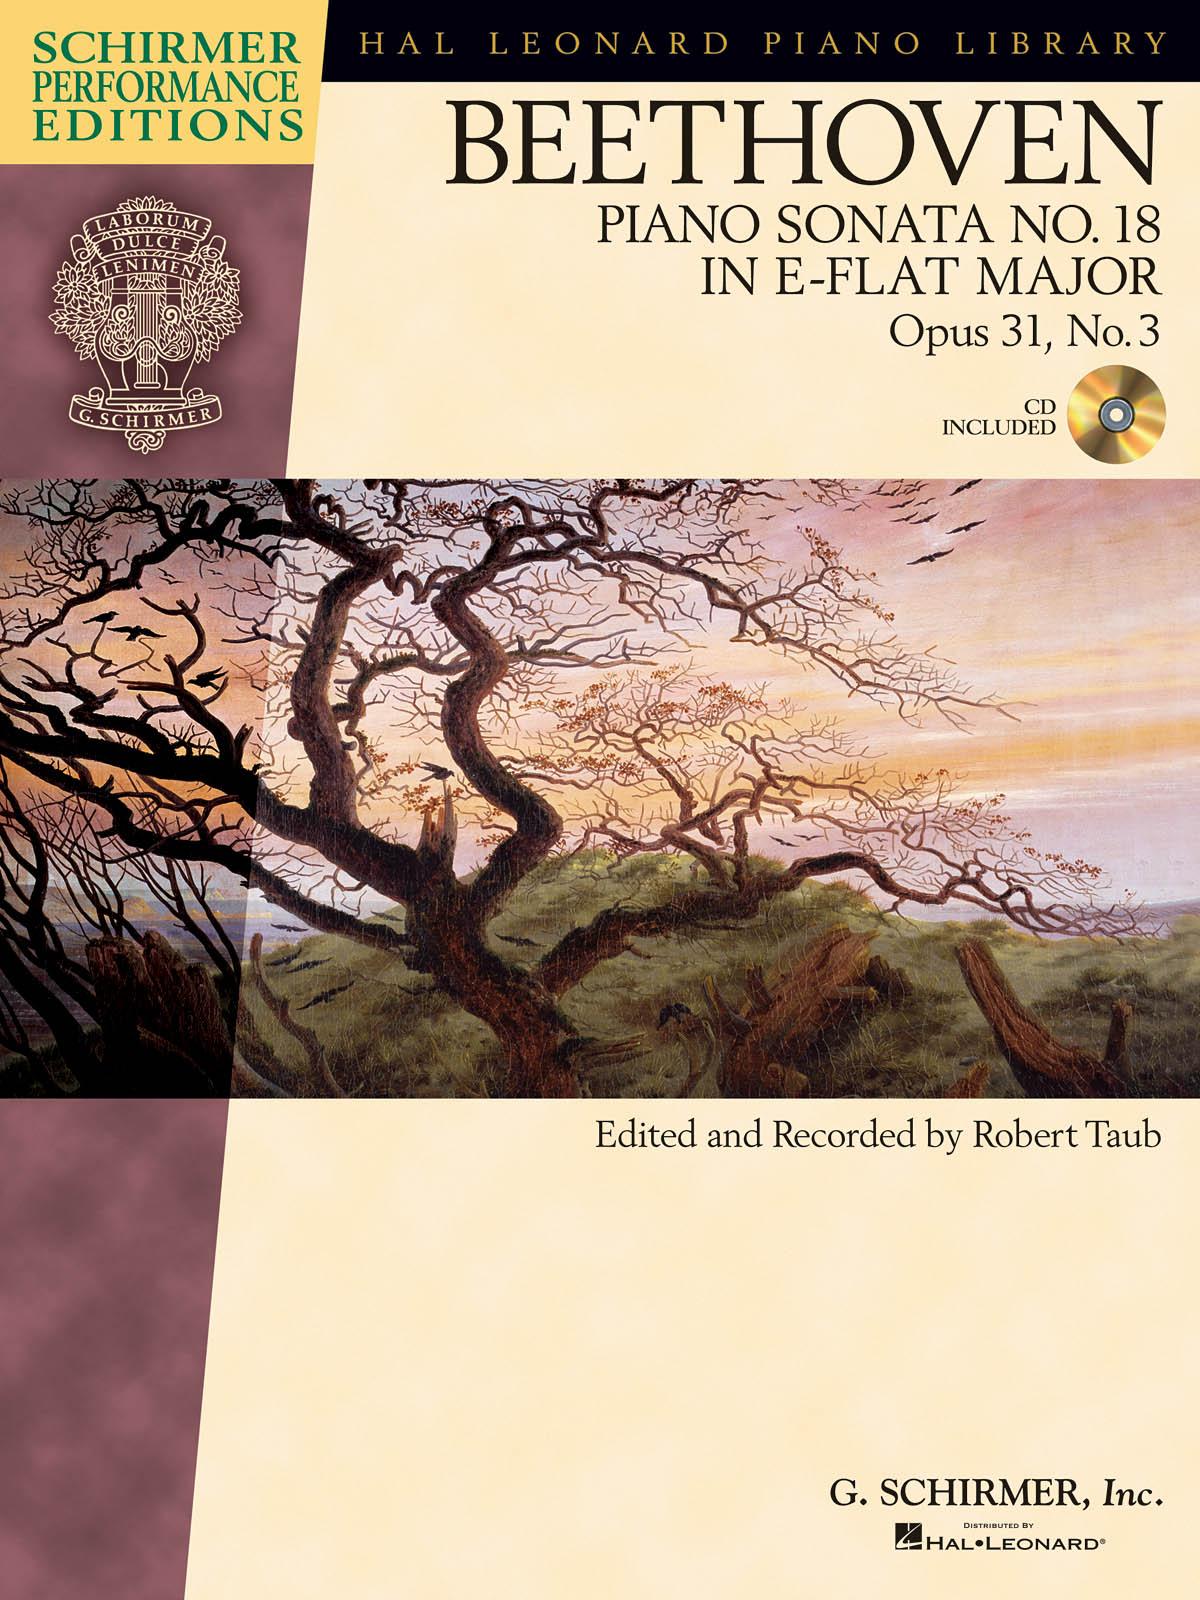 Ludwig Van Beethoven: Piano Sonata No.18 In E Flat Op.31 No.3 (Schirmer Performance Edition) (Schirmer Performance Editions)